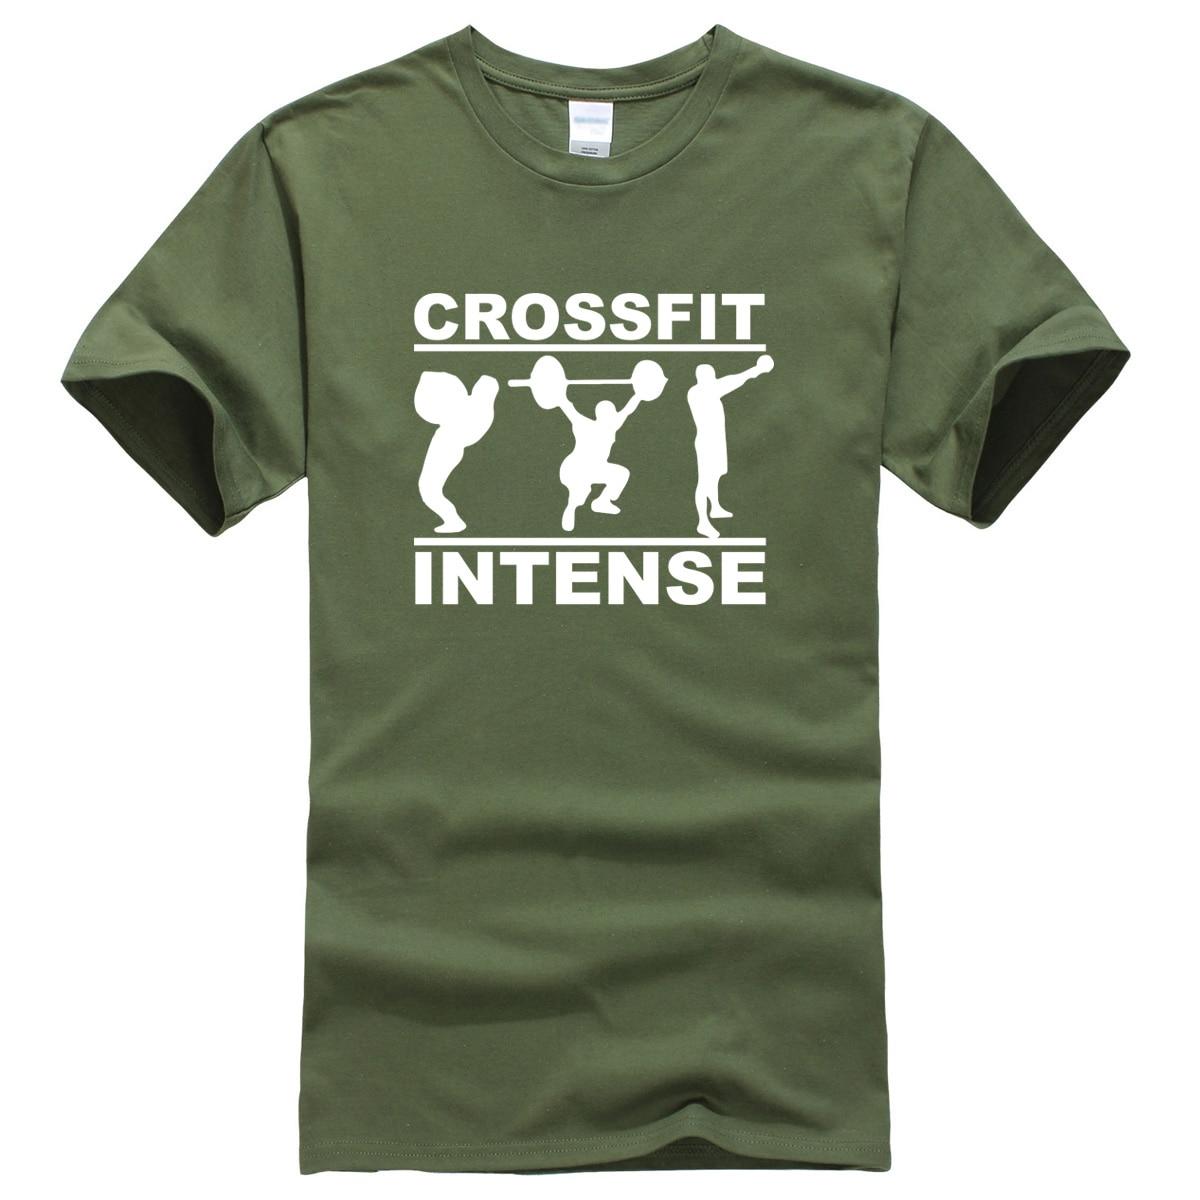 Crossfit Intense 2019 summer short sleeve 100% cotton T-shirt fashion casual brand men's T-shirts Crossfit tops tee hip hop